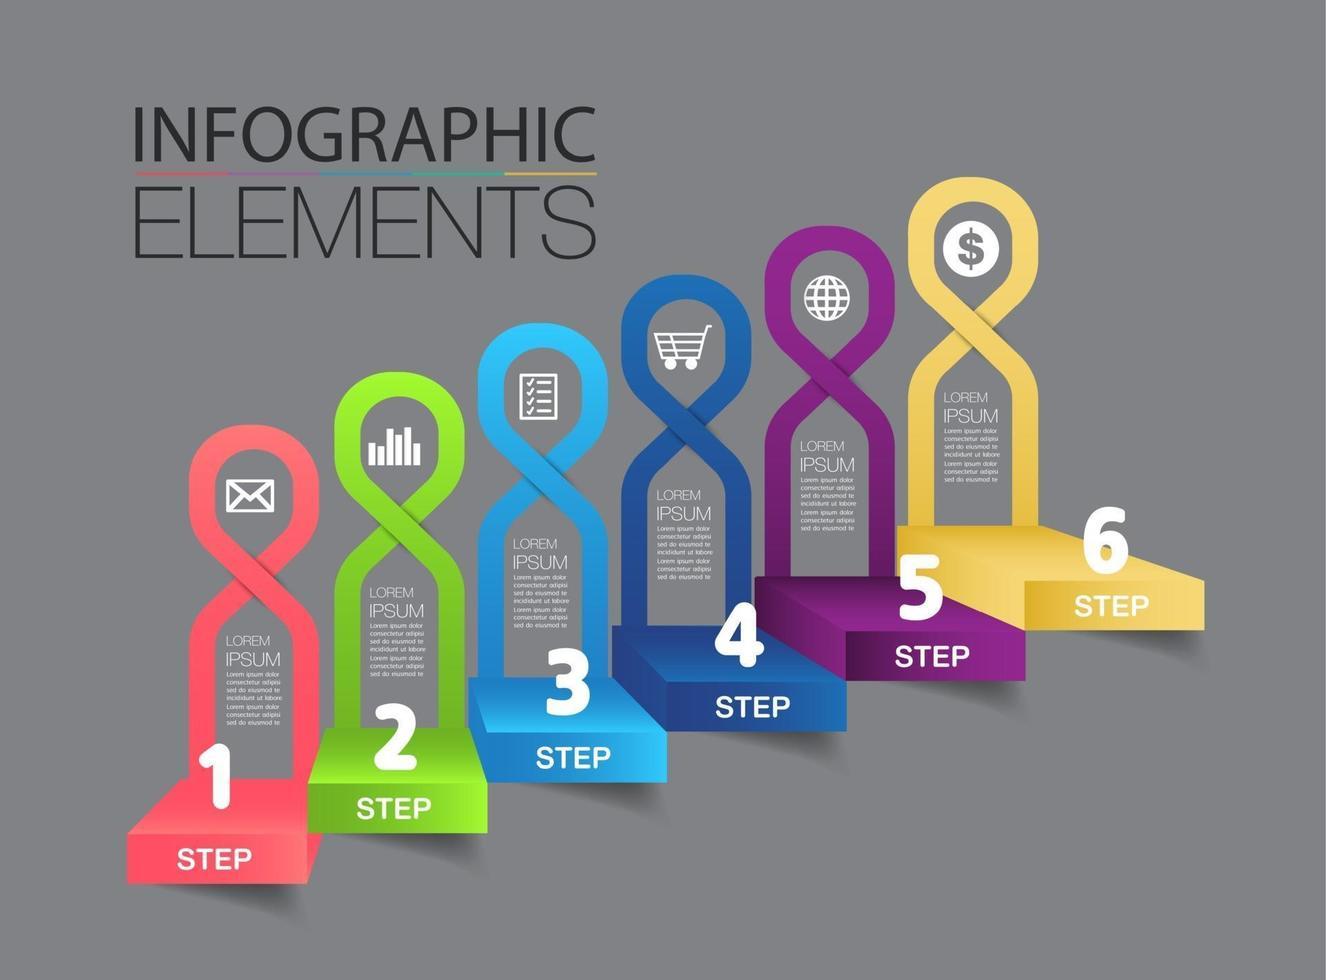 intensificar o conceito de sucesso empresarial. vetor de infográfico de escada